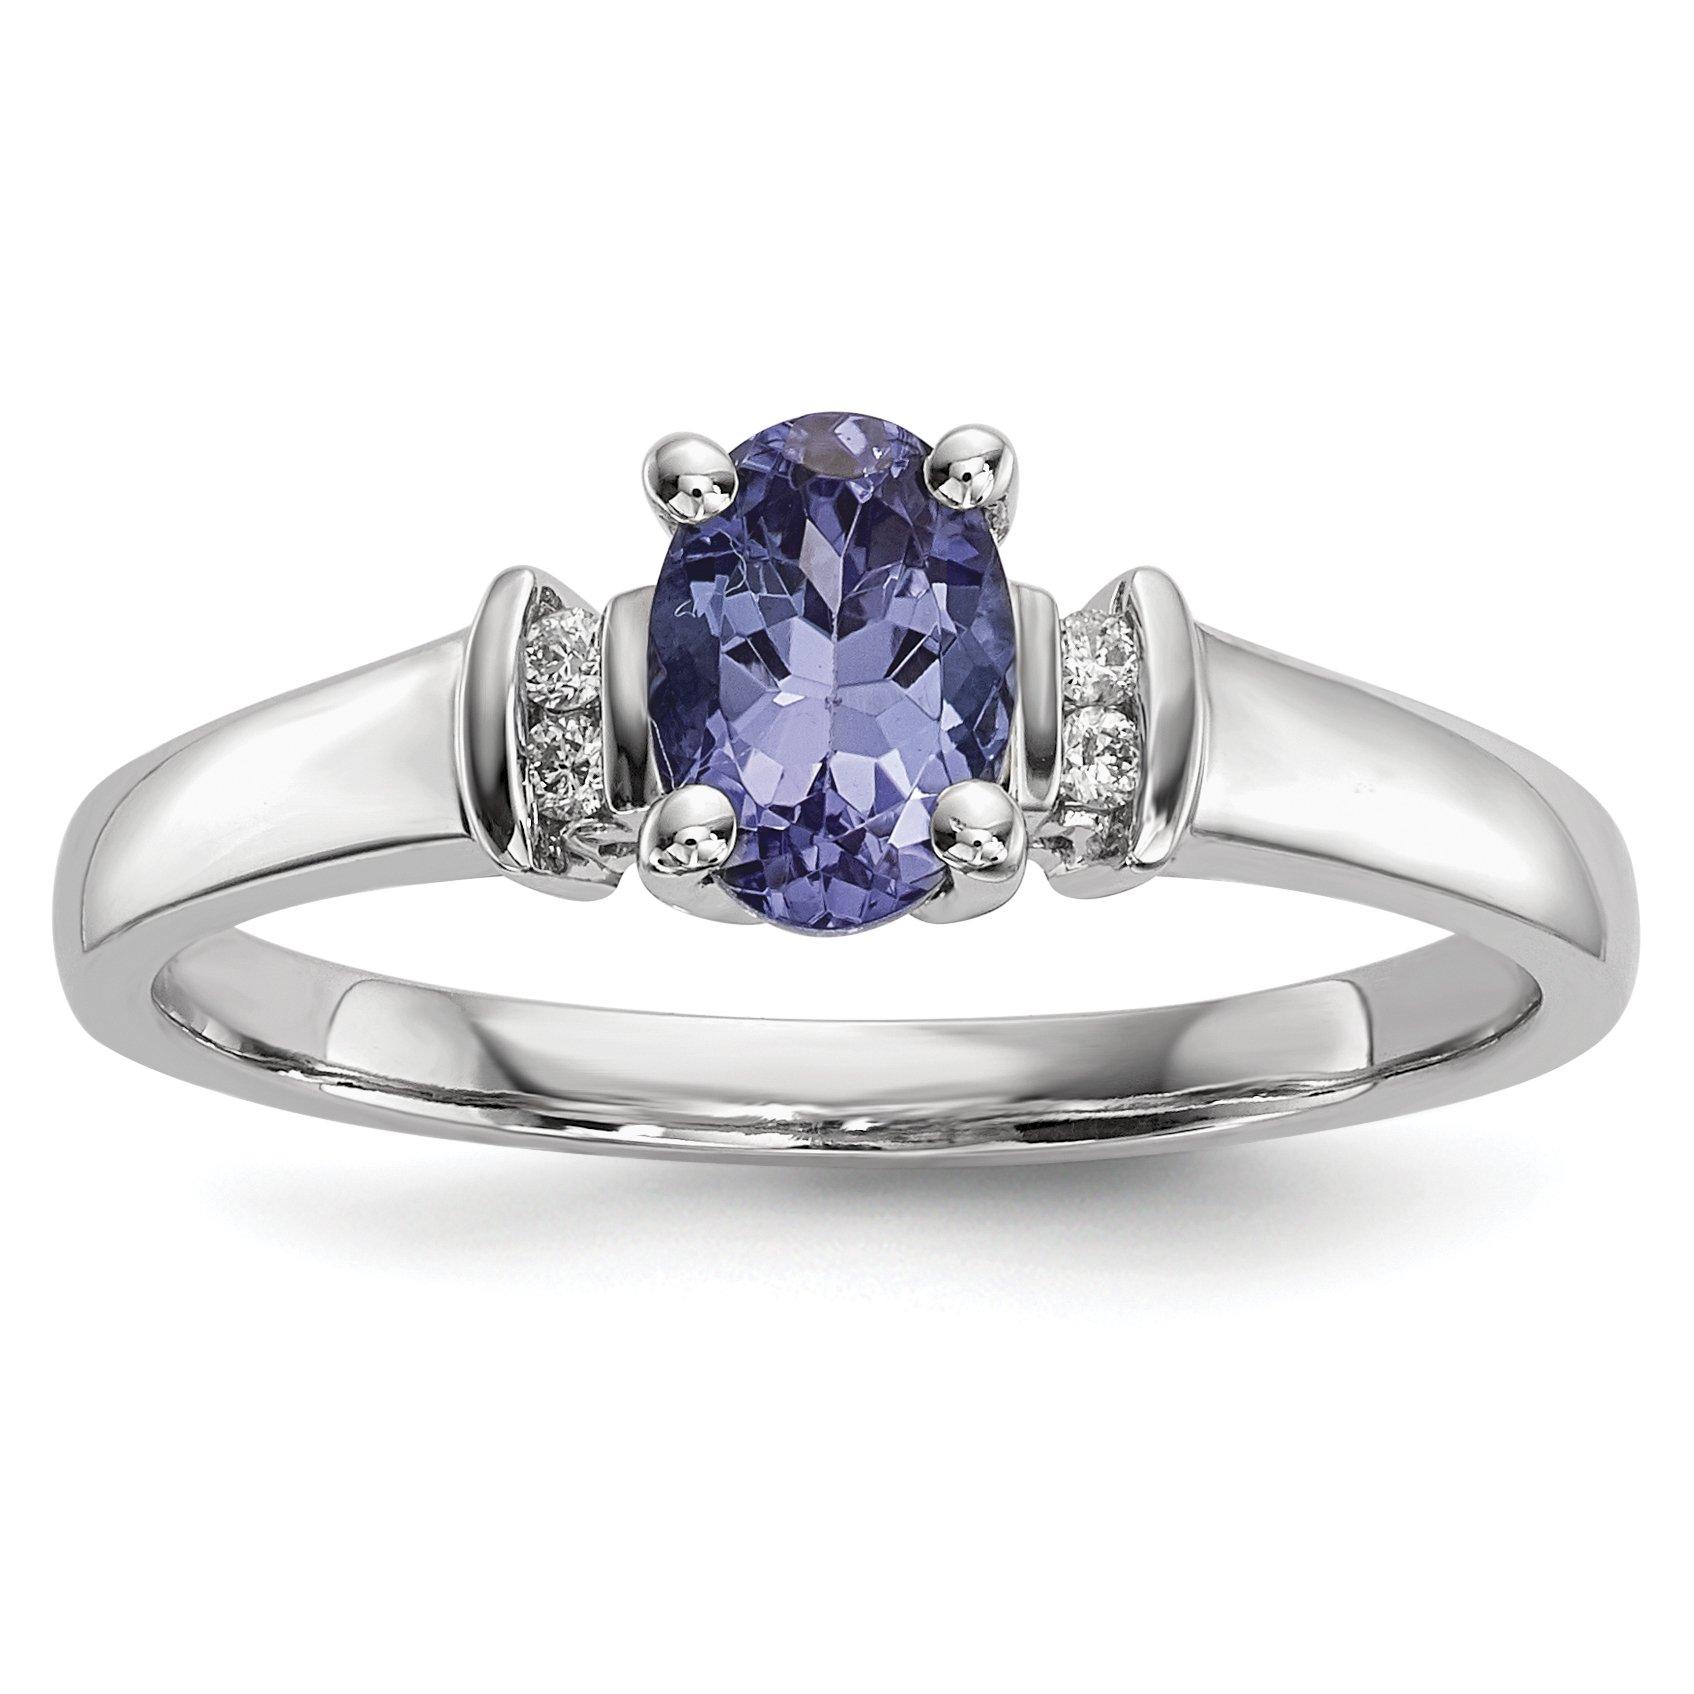 ICE CARATS 14k White Gold Blue Tanzanite Diamond Band Ring Size 7.00 Gemstone Fine Jewelry Gift Set For Women Heart